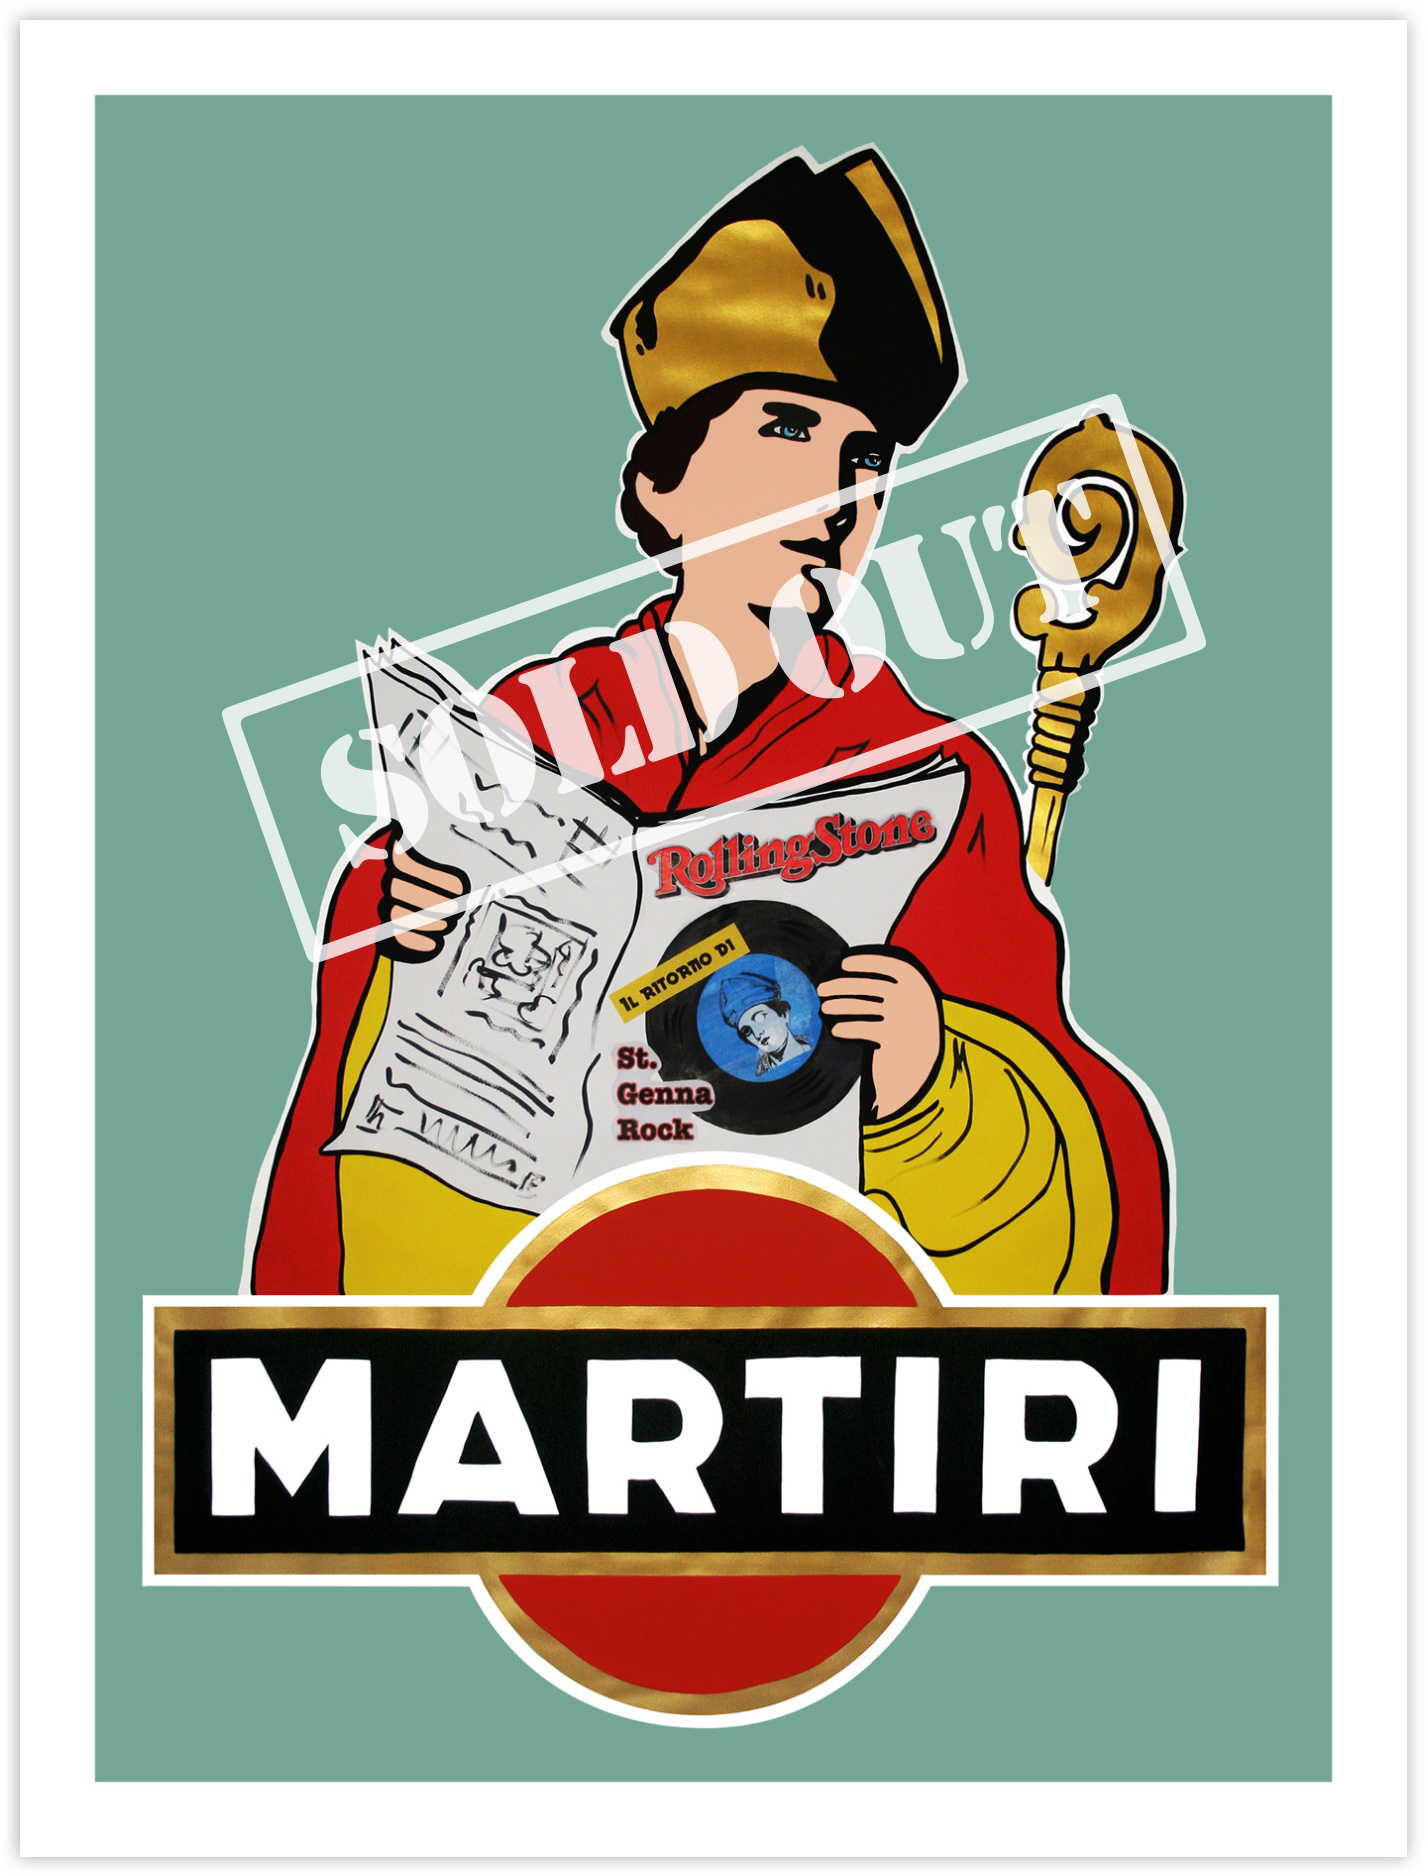 A Martyr to Drink - St. GennaRock (San Gennaro) 2020